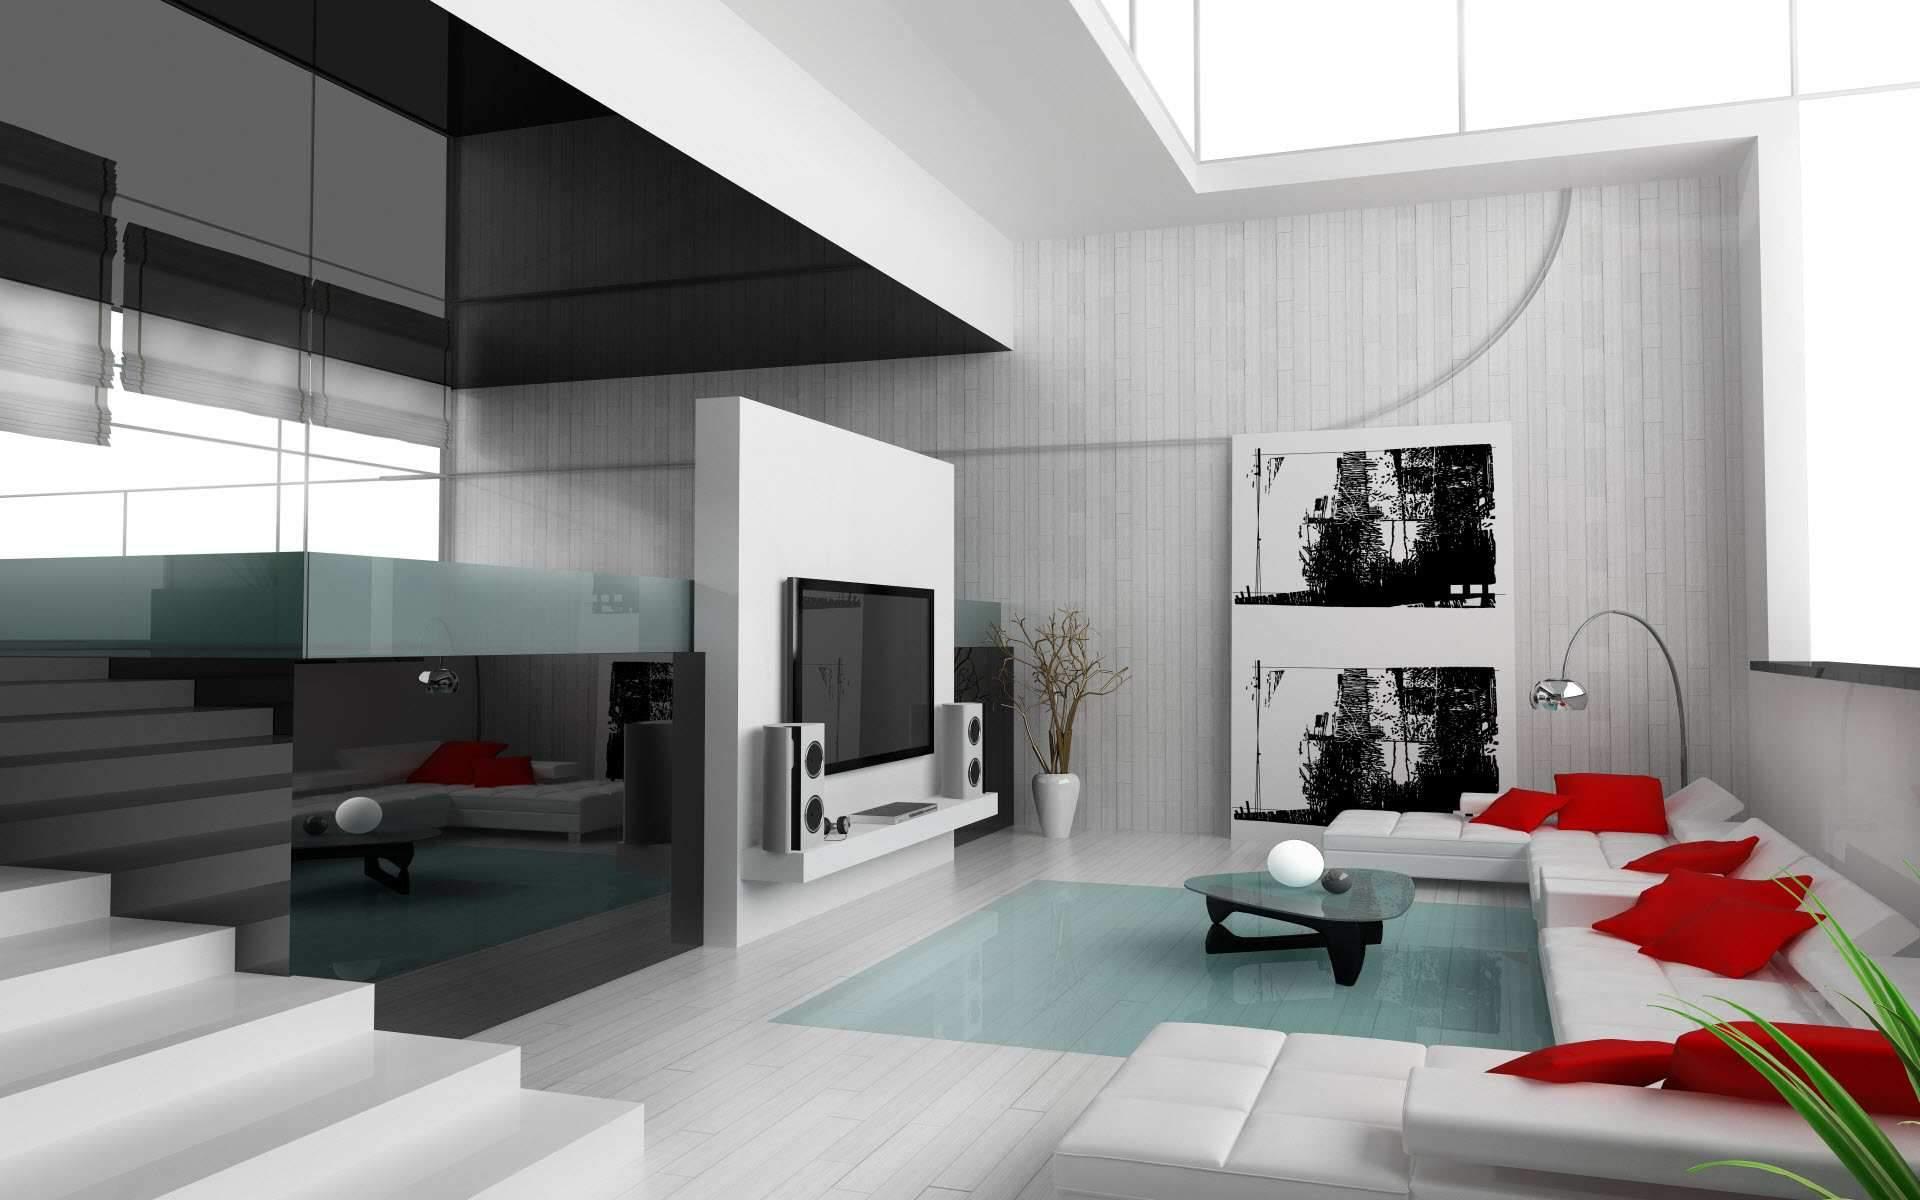 Modern Interior Design Ideas 12 Design Ideas - EnhancedHomes.org